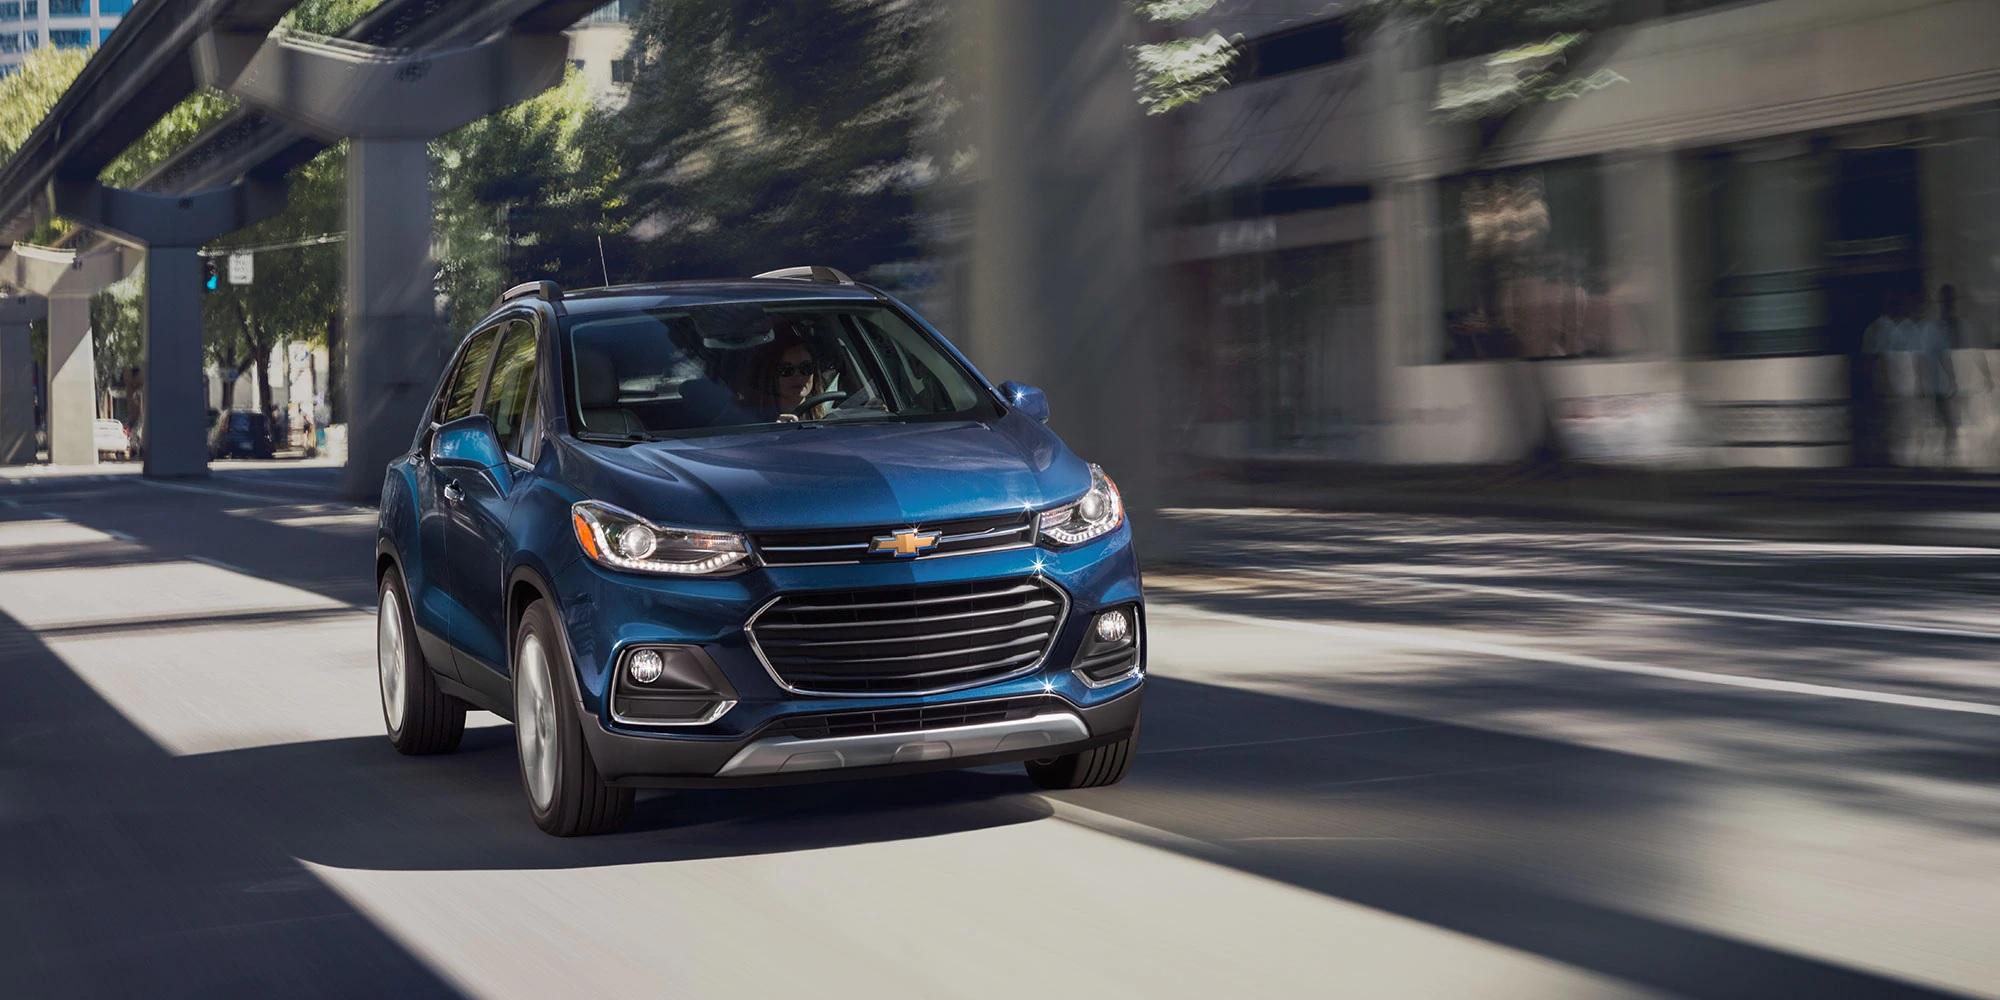 2020 Chevrolet Trax for Sale near Lansing, MI